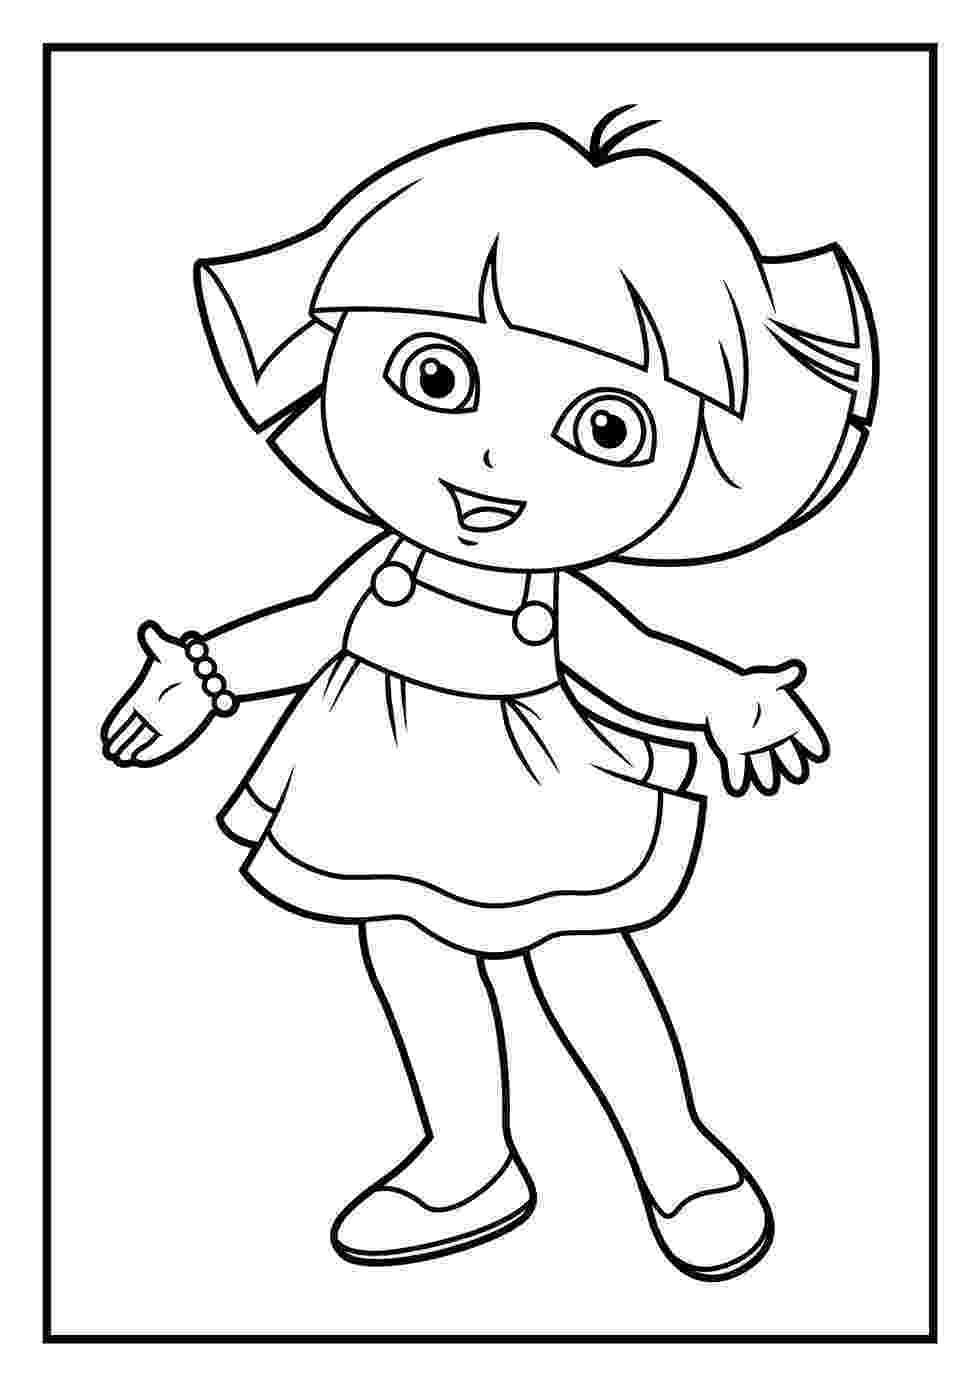 dora color printable dora coloring pages free printable coloring dora color